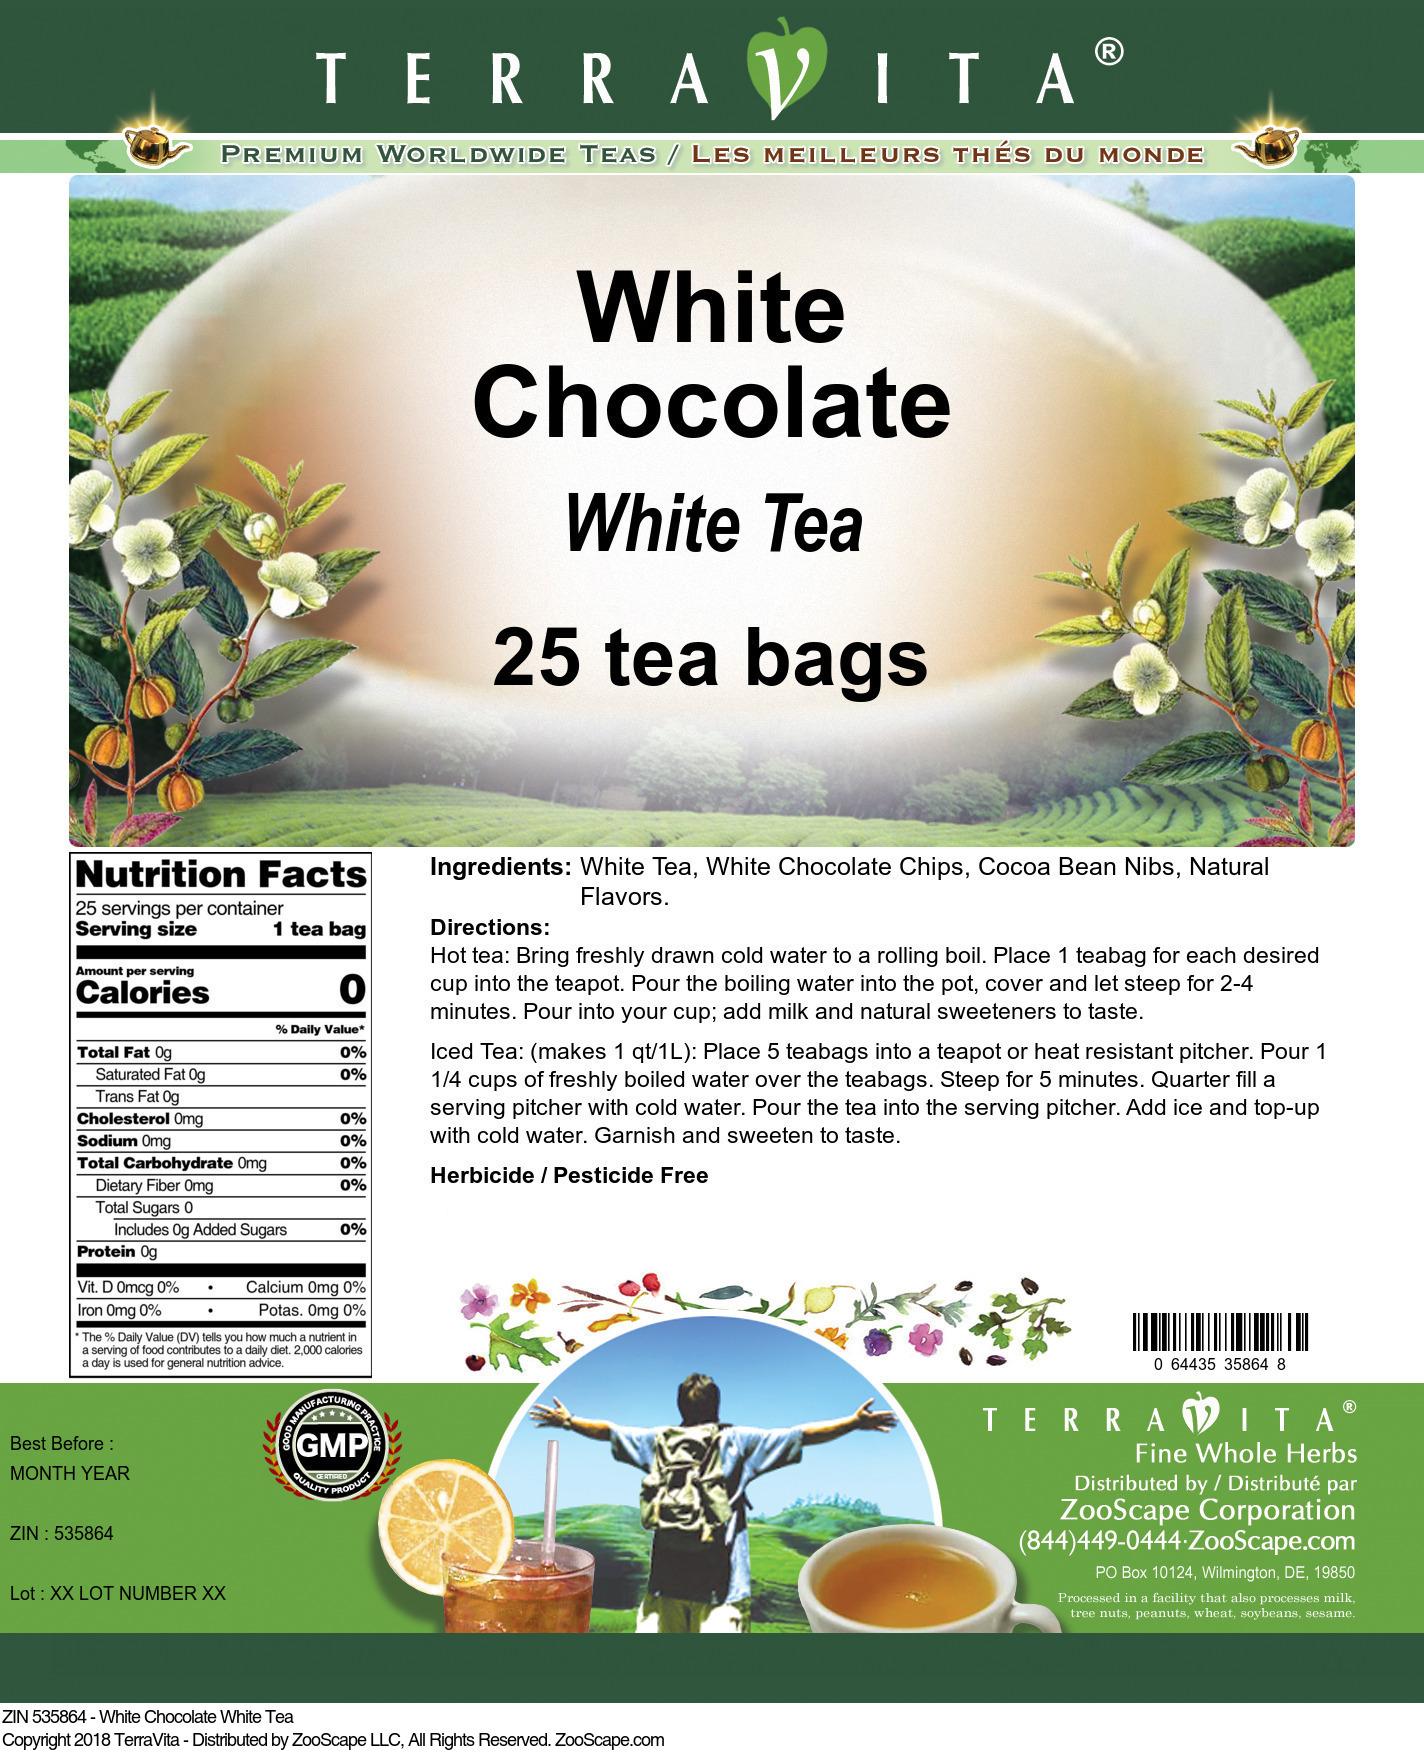 White Chocolate White Tea